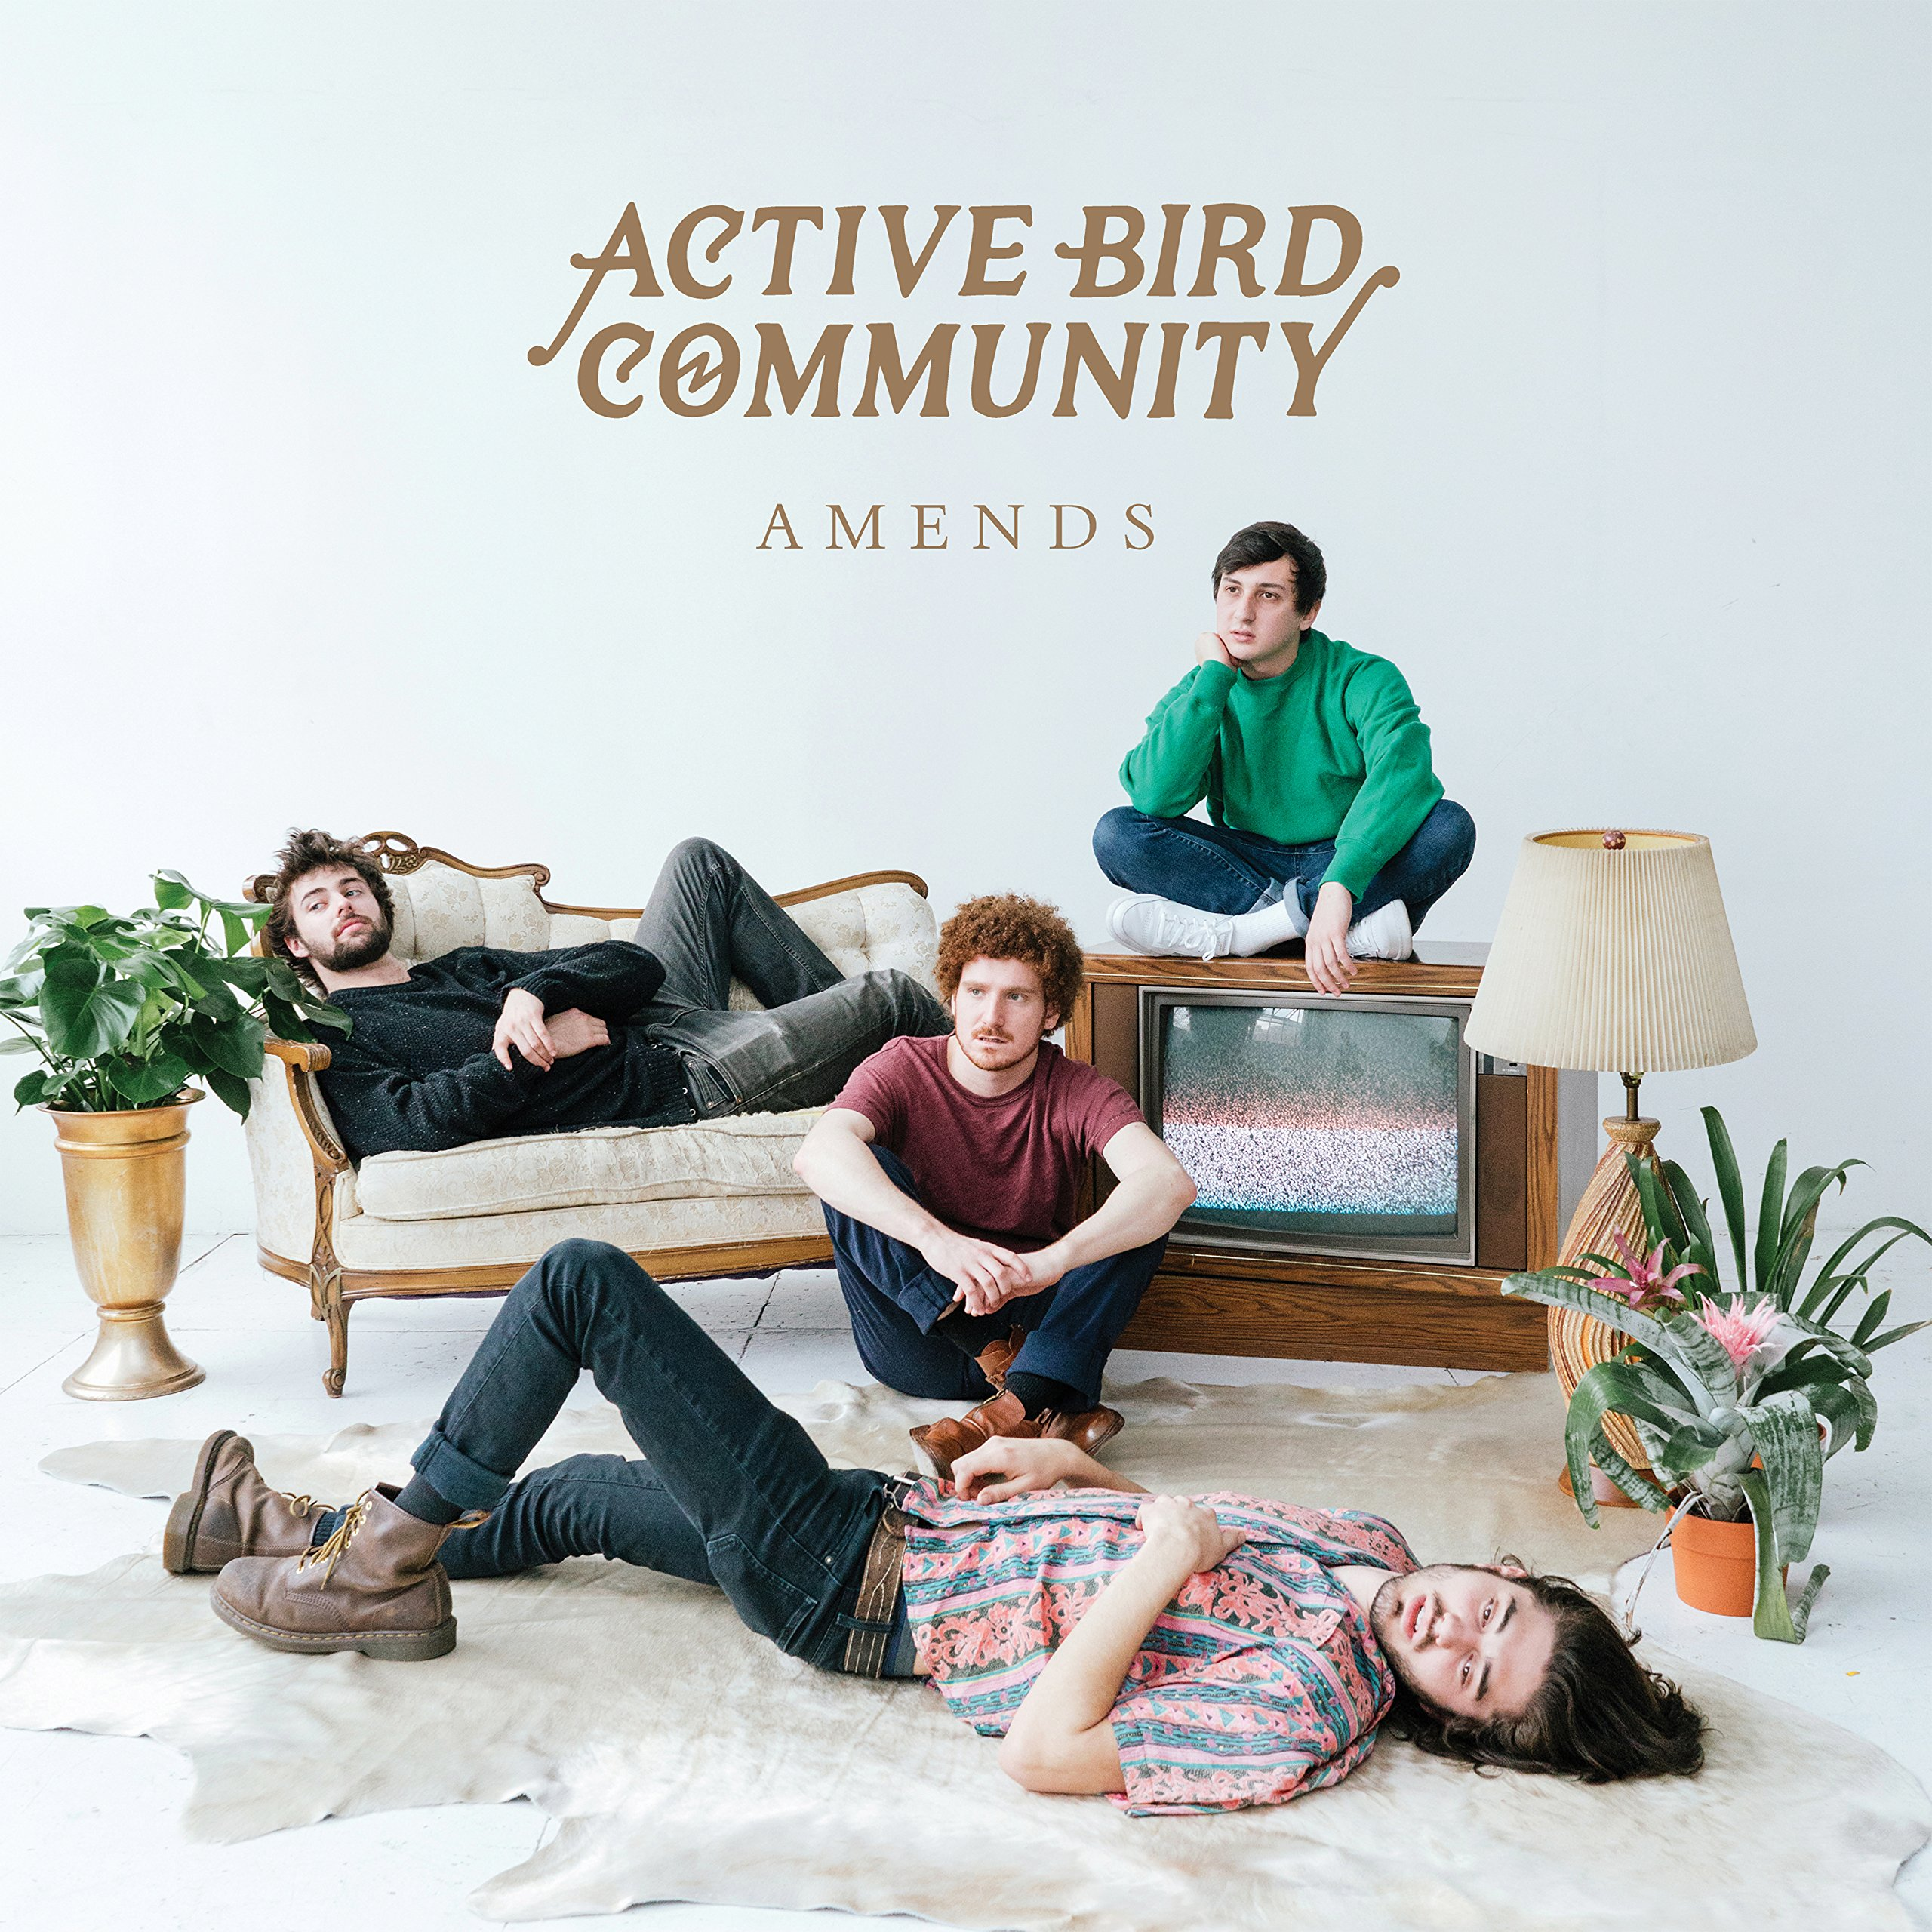 Cassette : Active Bird Community - Amends (Cassette)